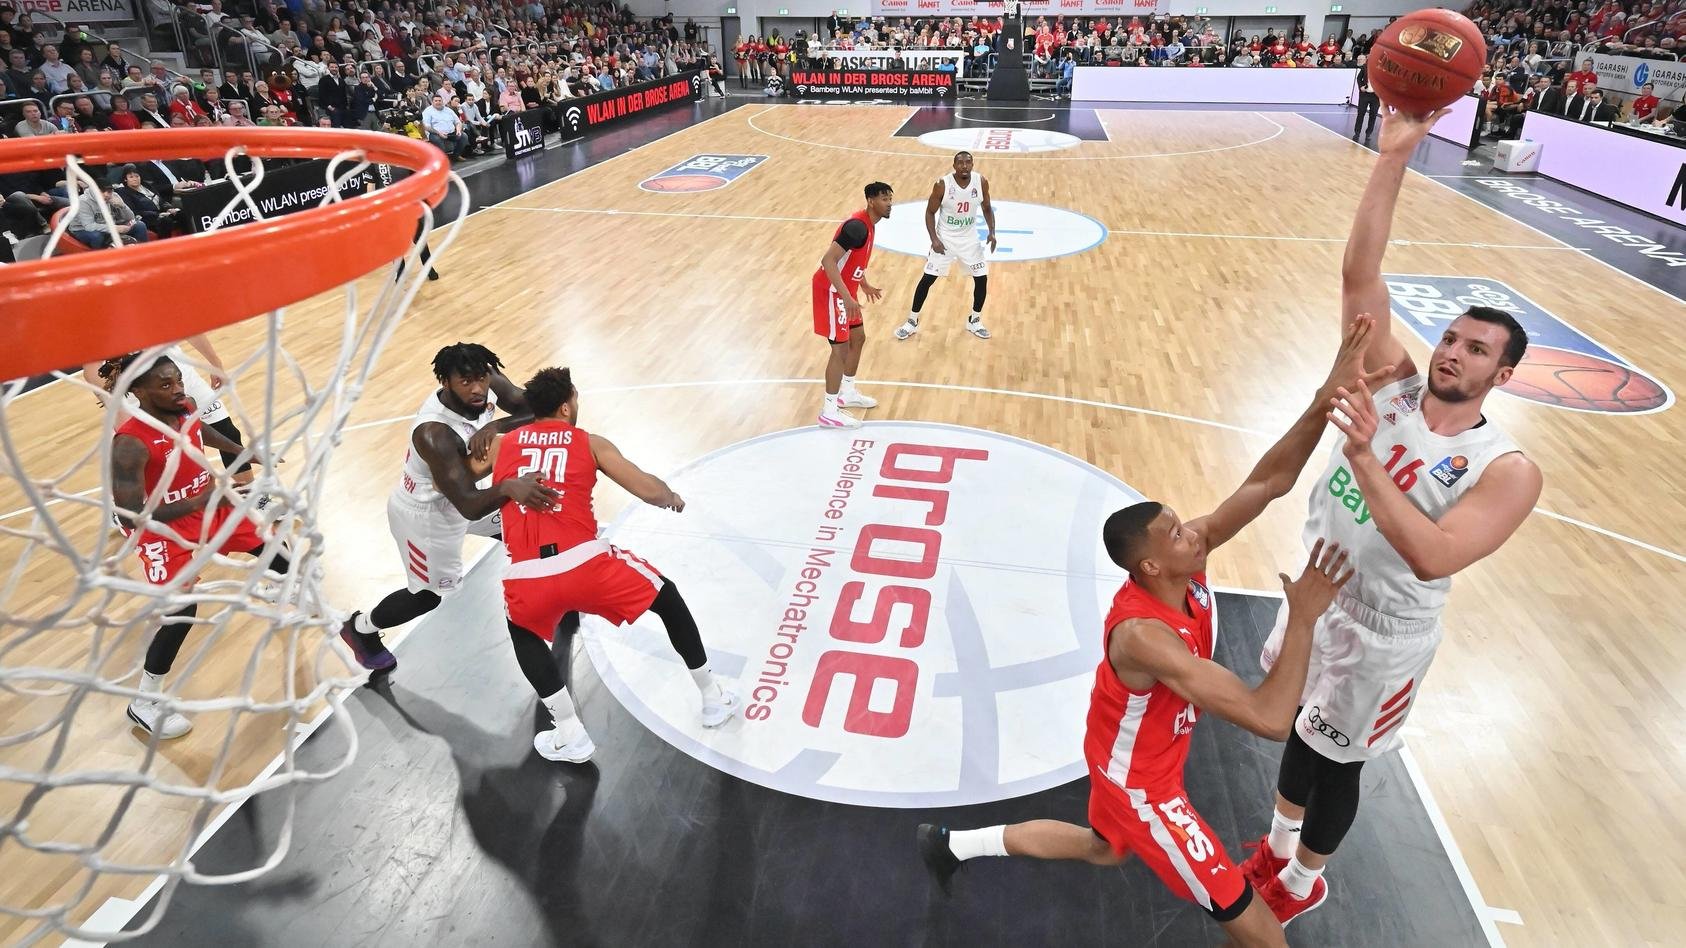 BAMBERG 30.12.2019 --- Basketball ---- easycredit 1. Basketball Bundesliga ---- 14. Spieltag: Brose Bamberg vs FC Bayern